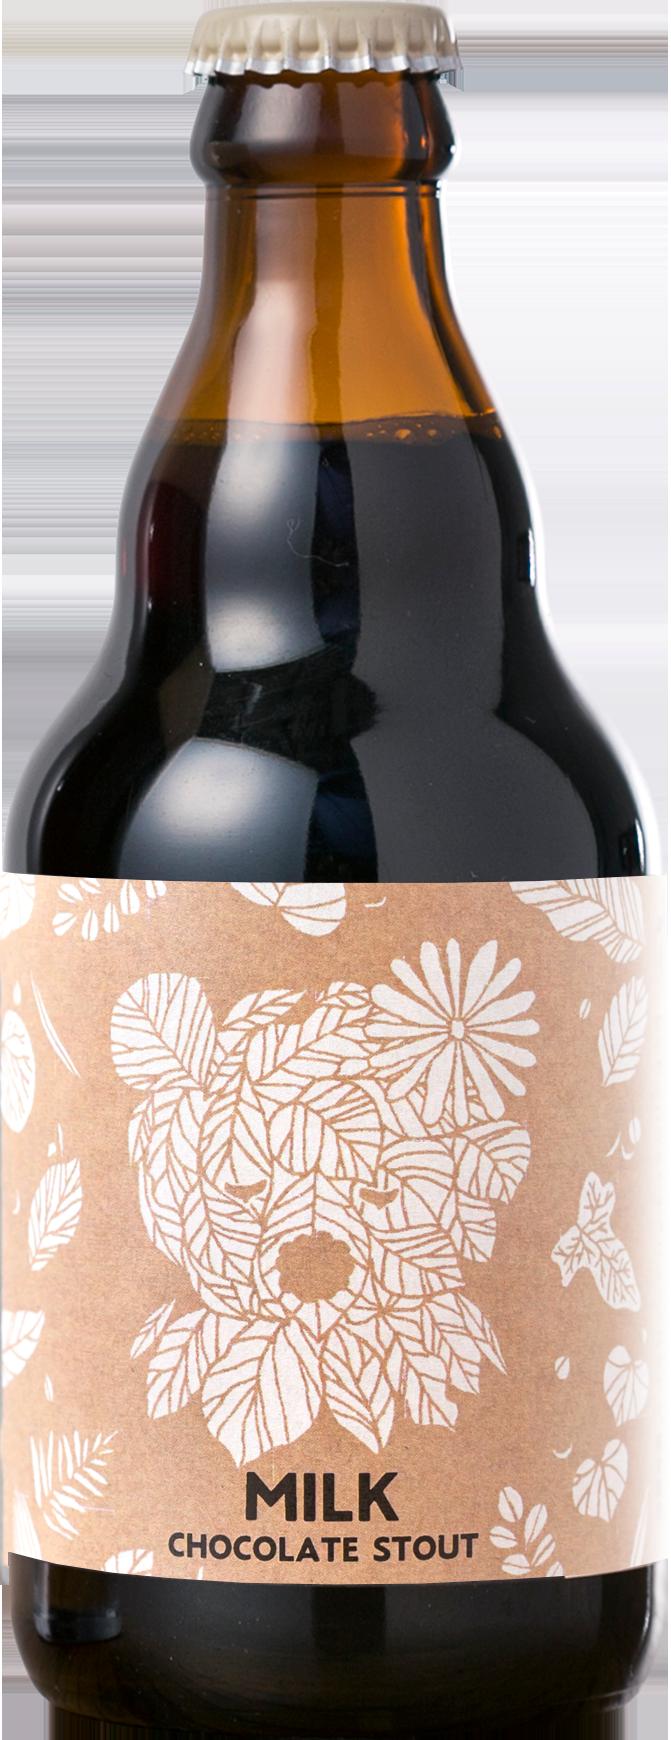 Baeren milk chocolate stout beerボトル-ミルク・チョコレートスタウトボトル.png